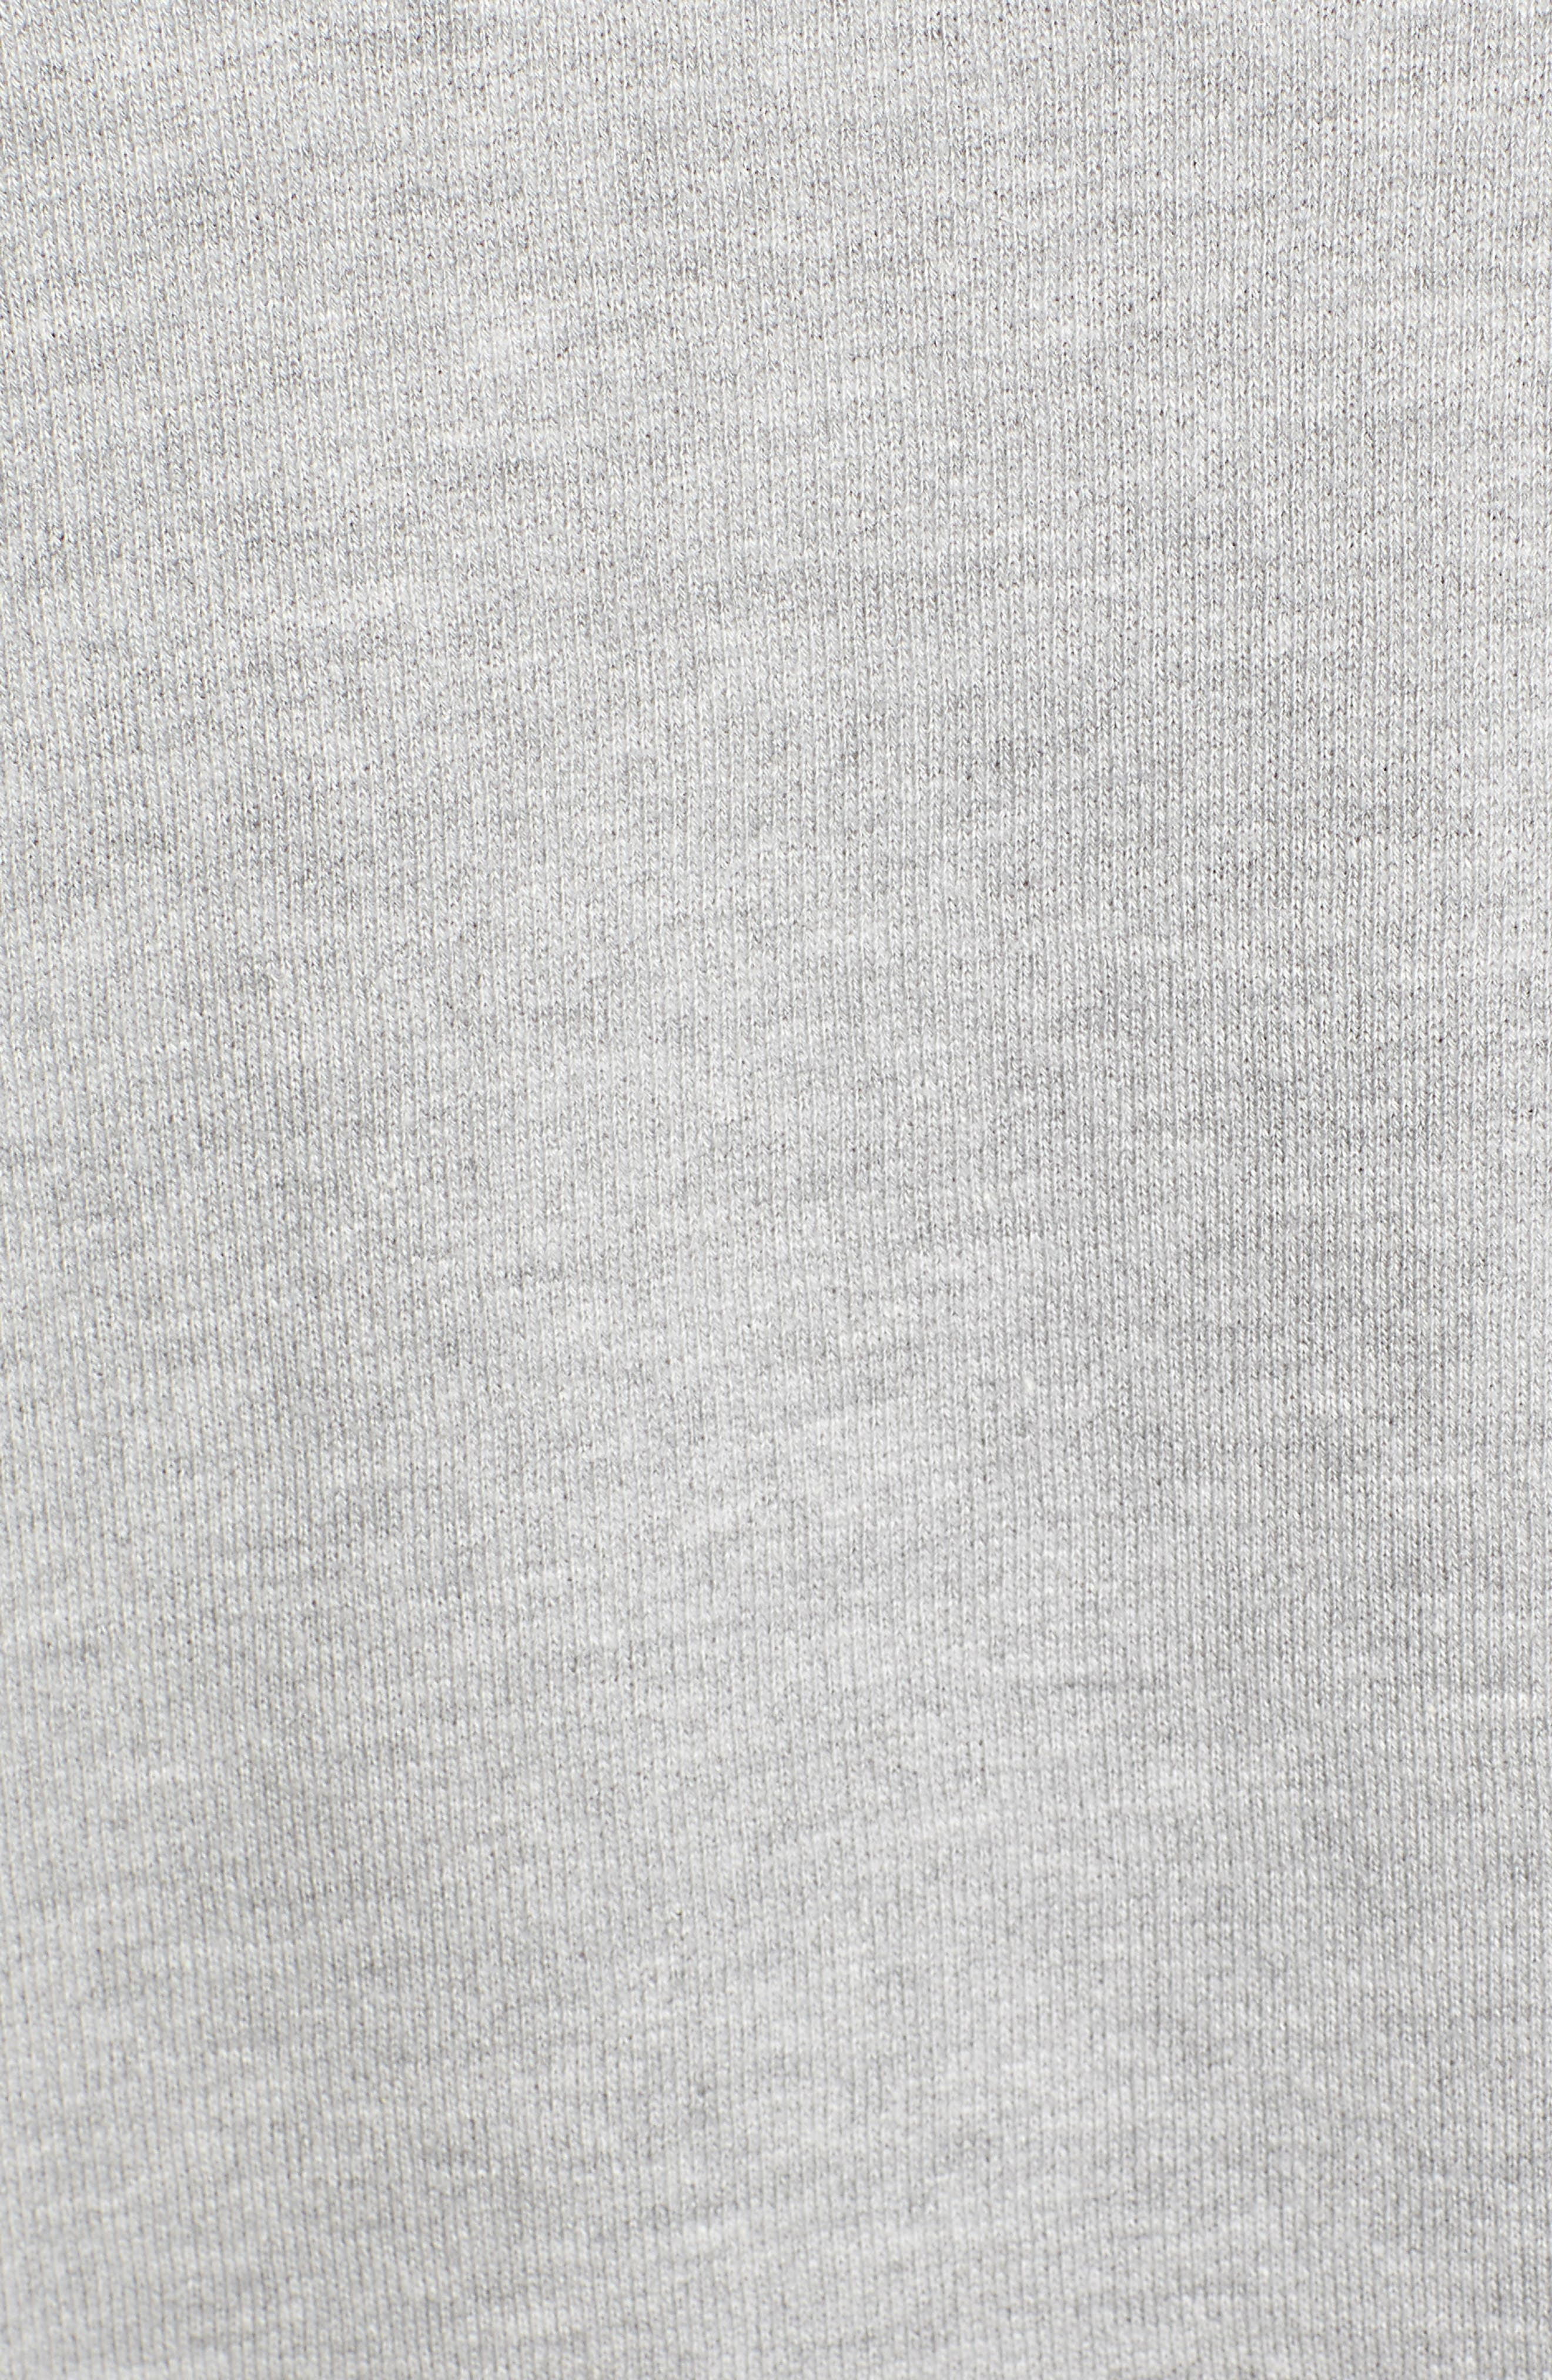 Hibiscus Junior Sweatshirt,                             Alternate thumbnail 5, color,                             020